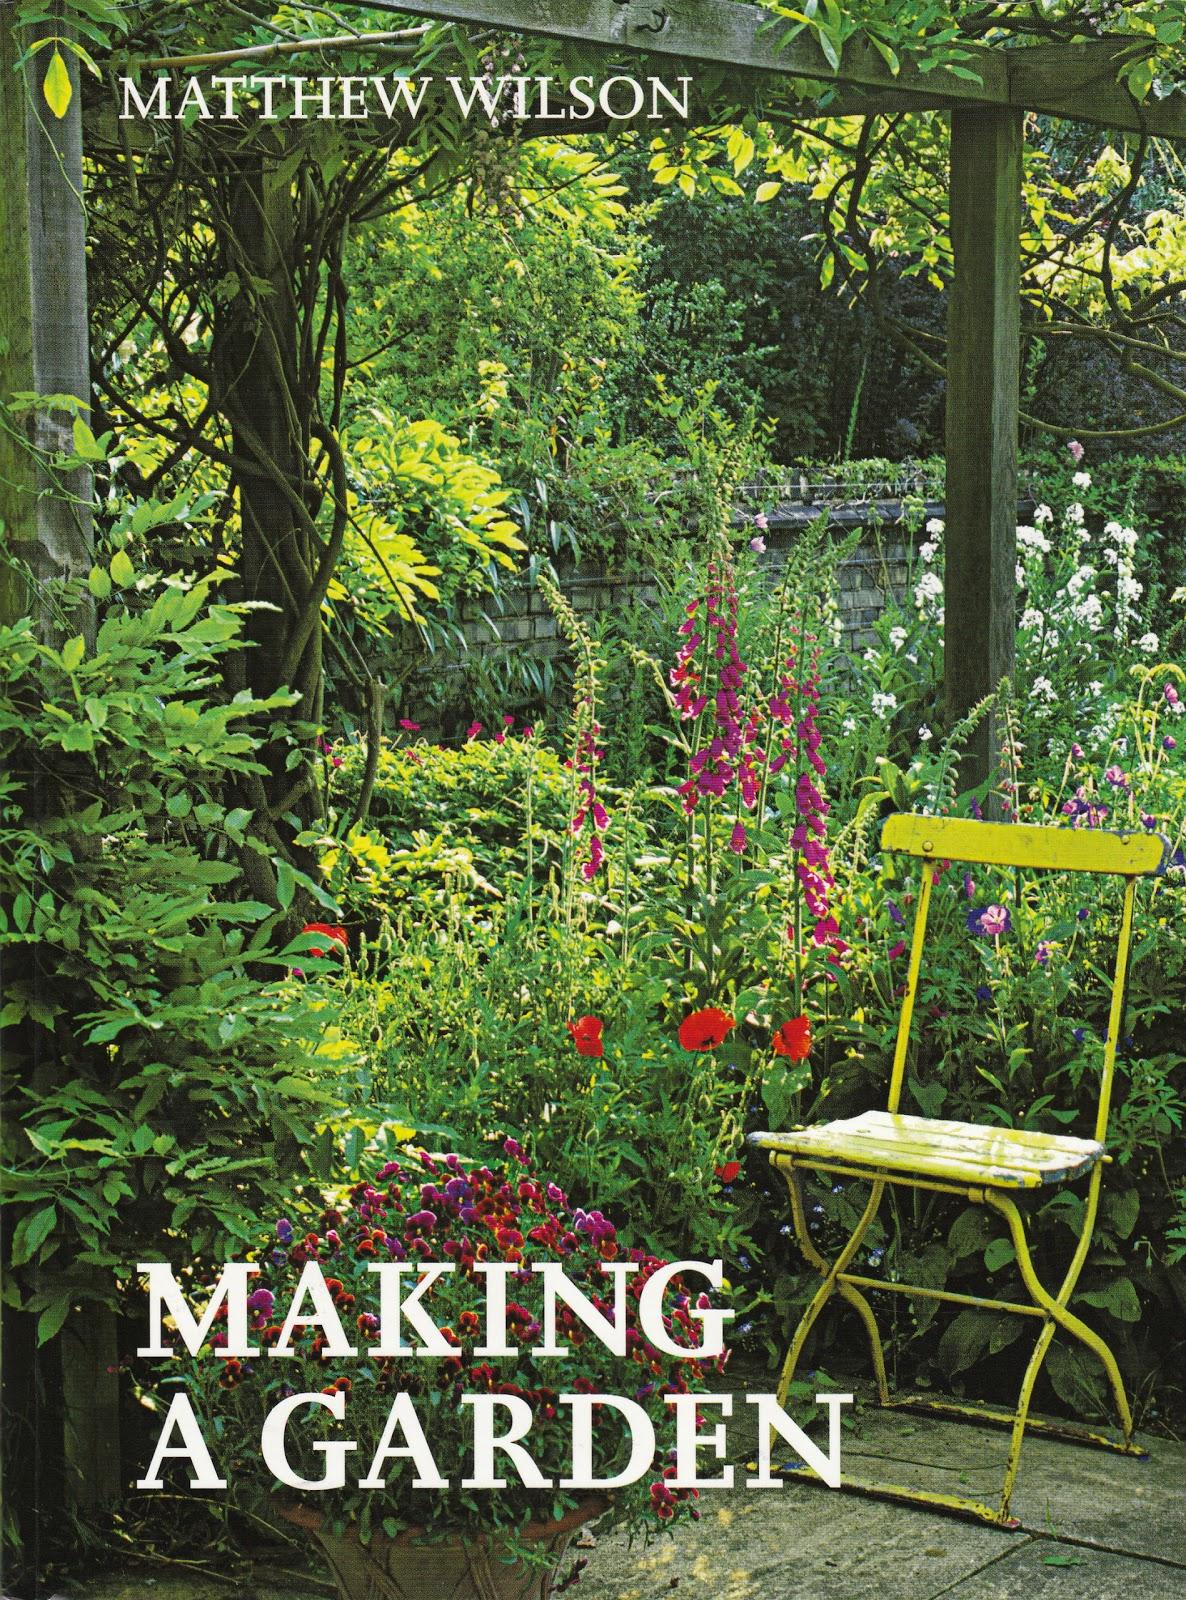 Making garden soil mix